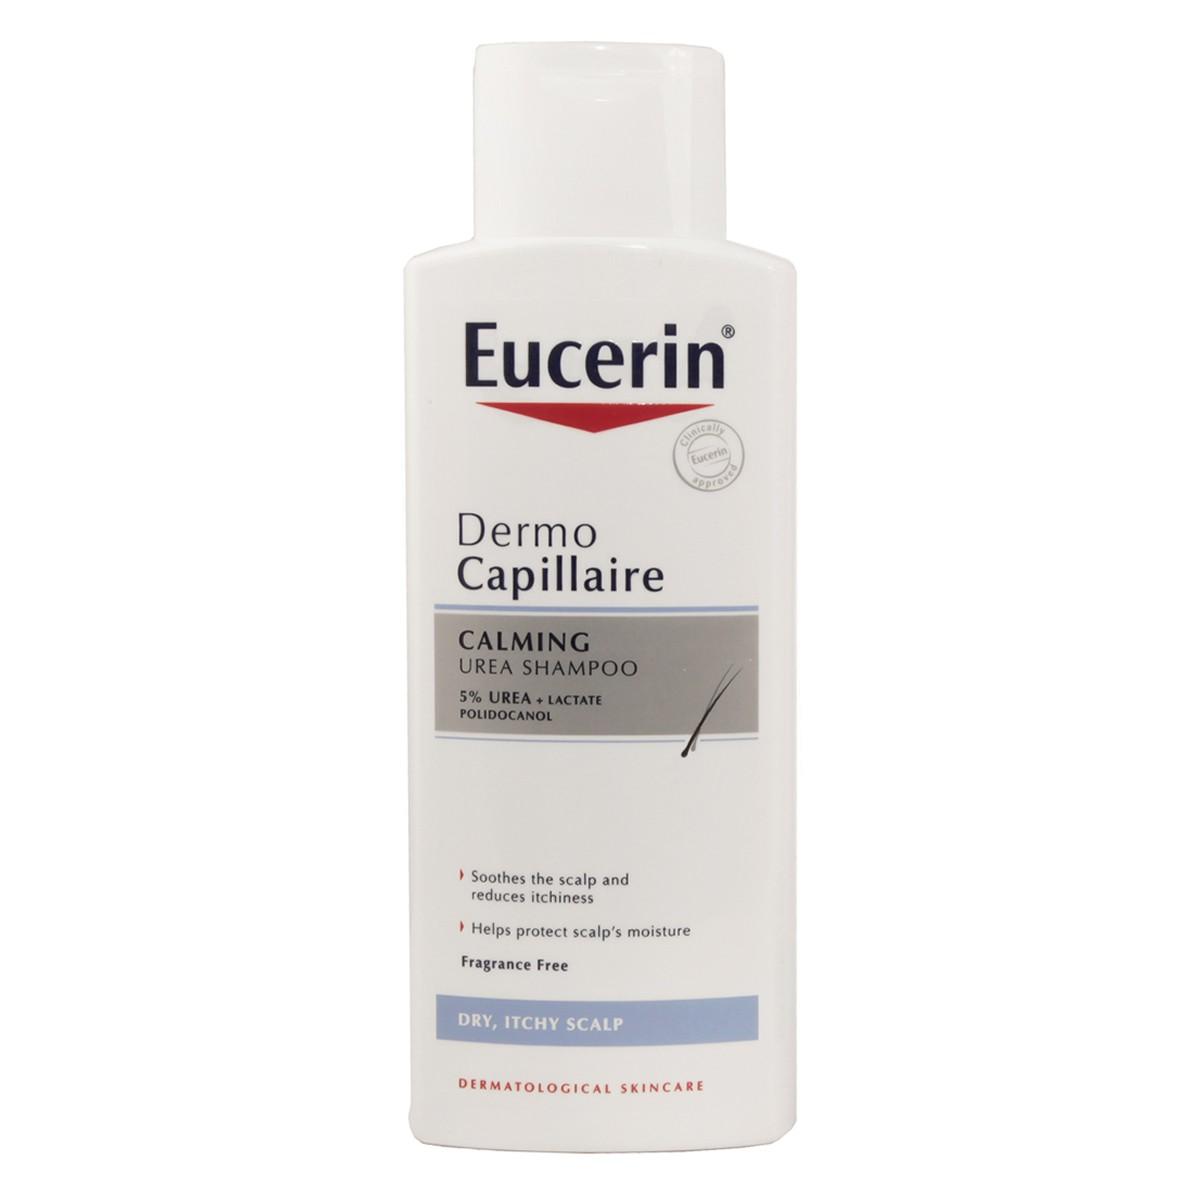 Eucerin Dermo Capillaire Calming Urea Shampoo